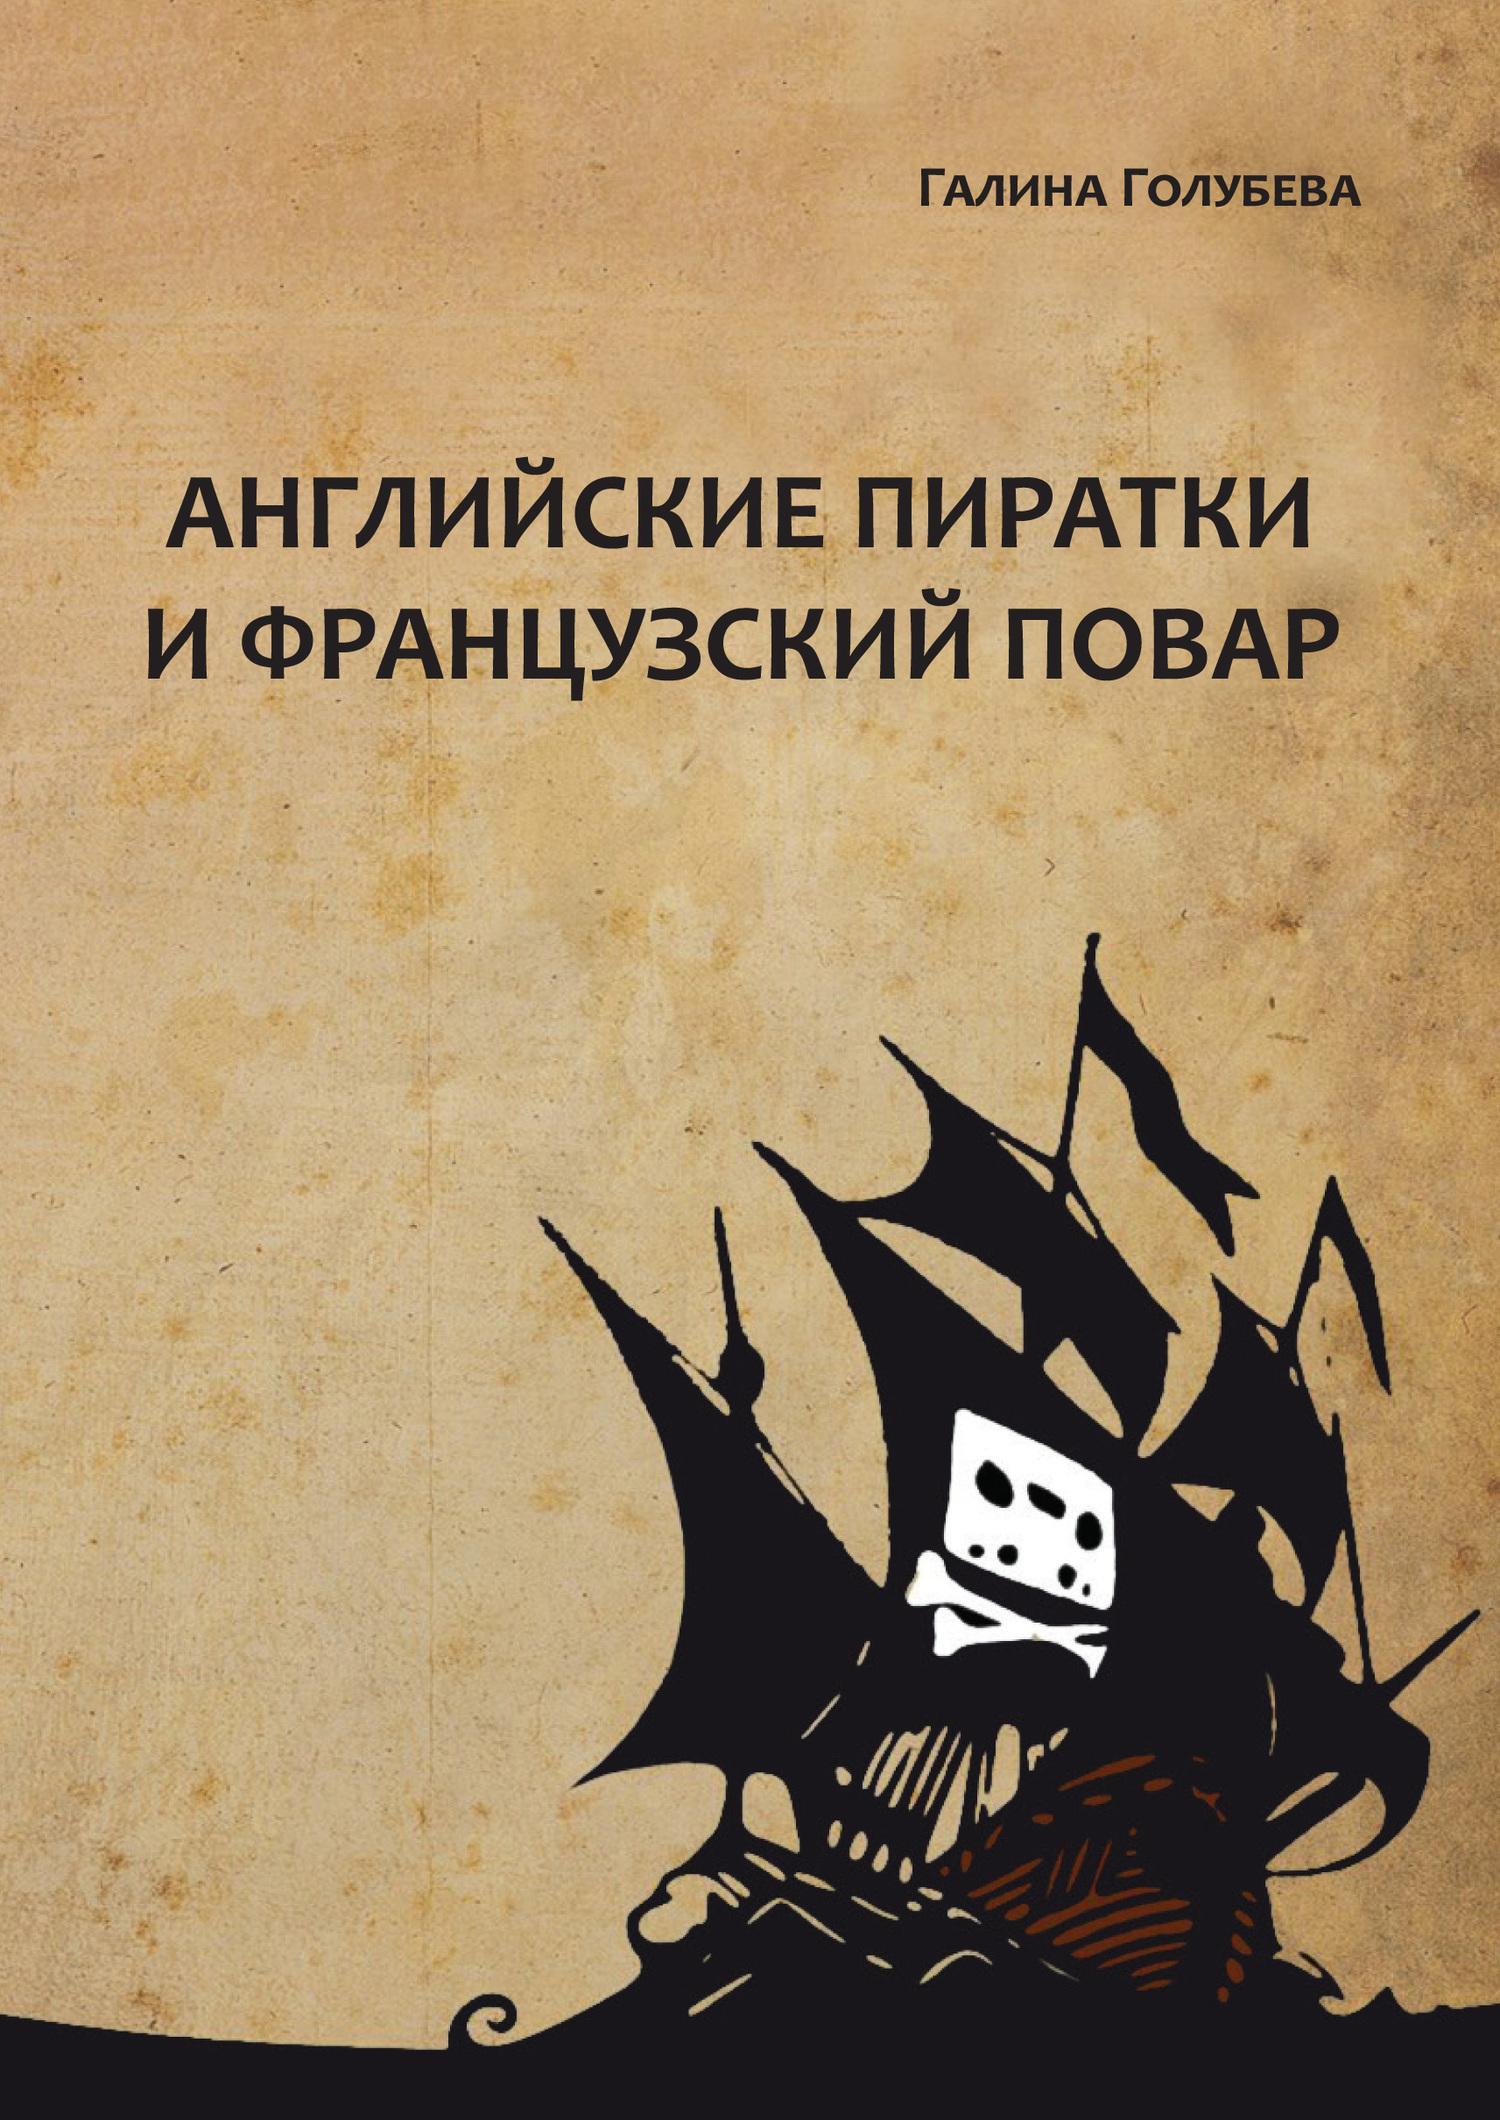 Английские пиратки и французский повар